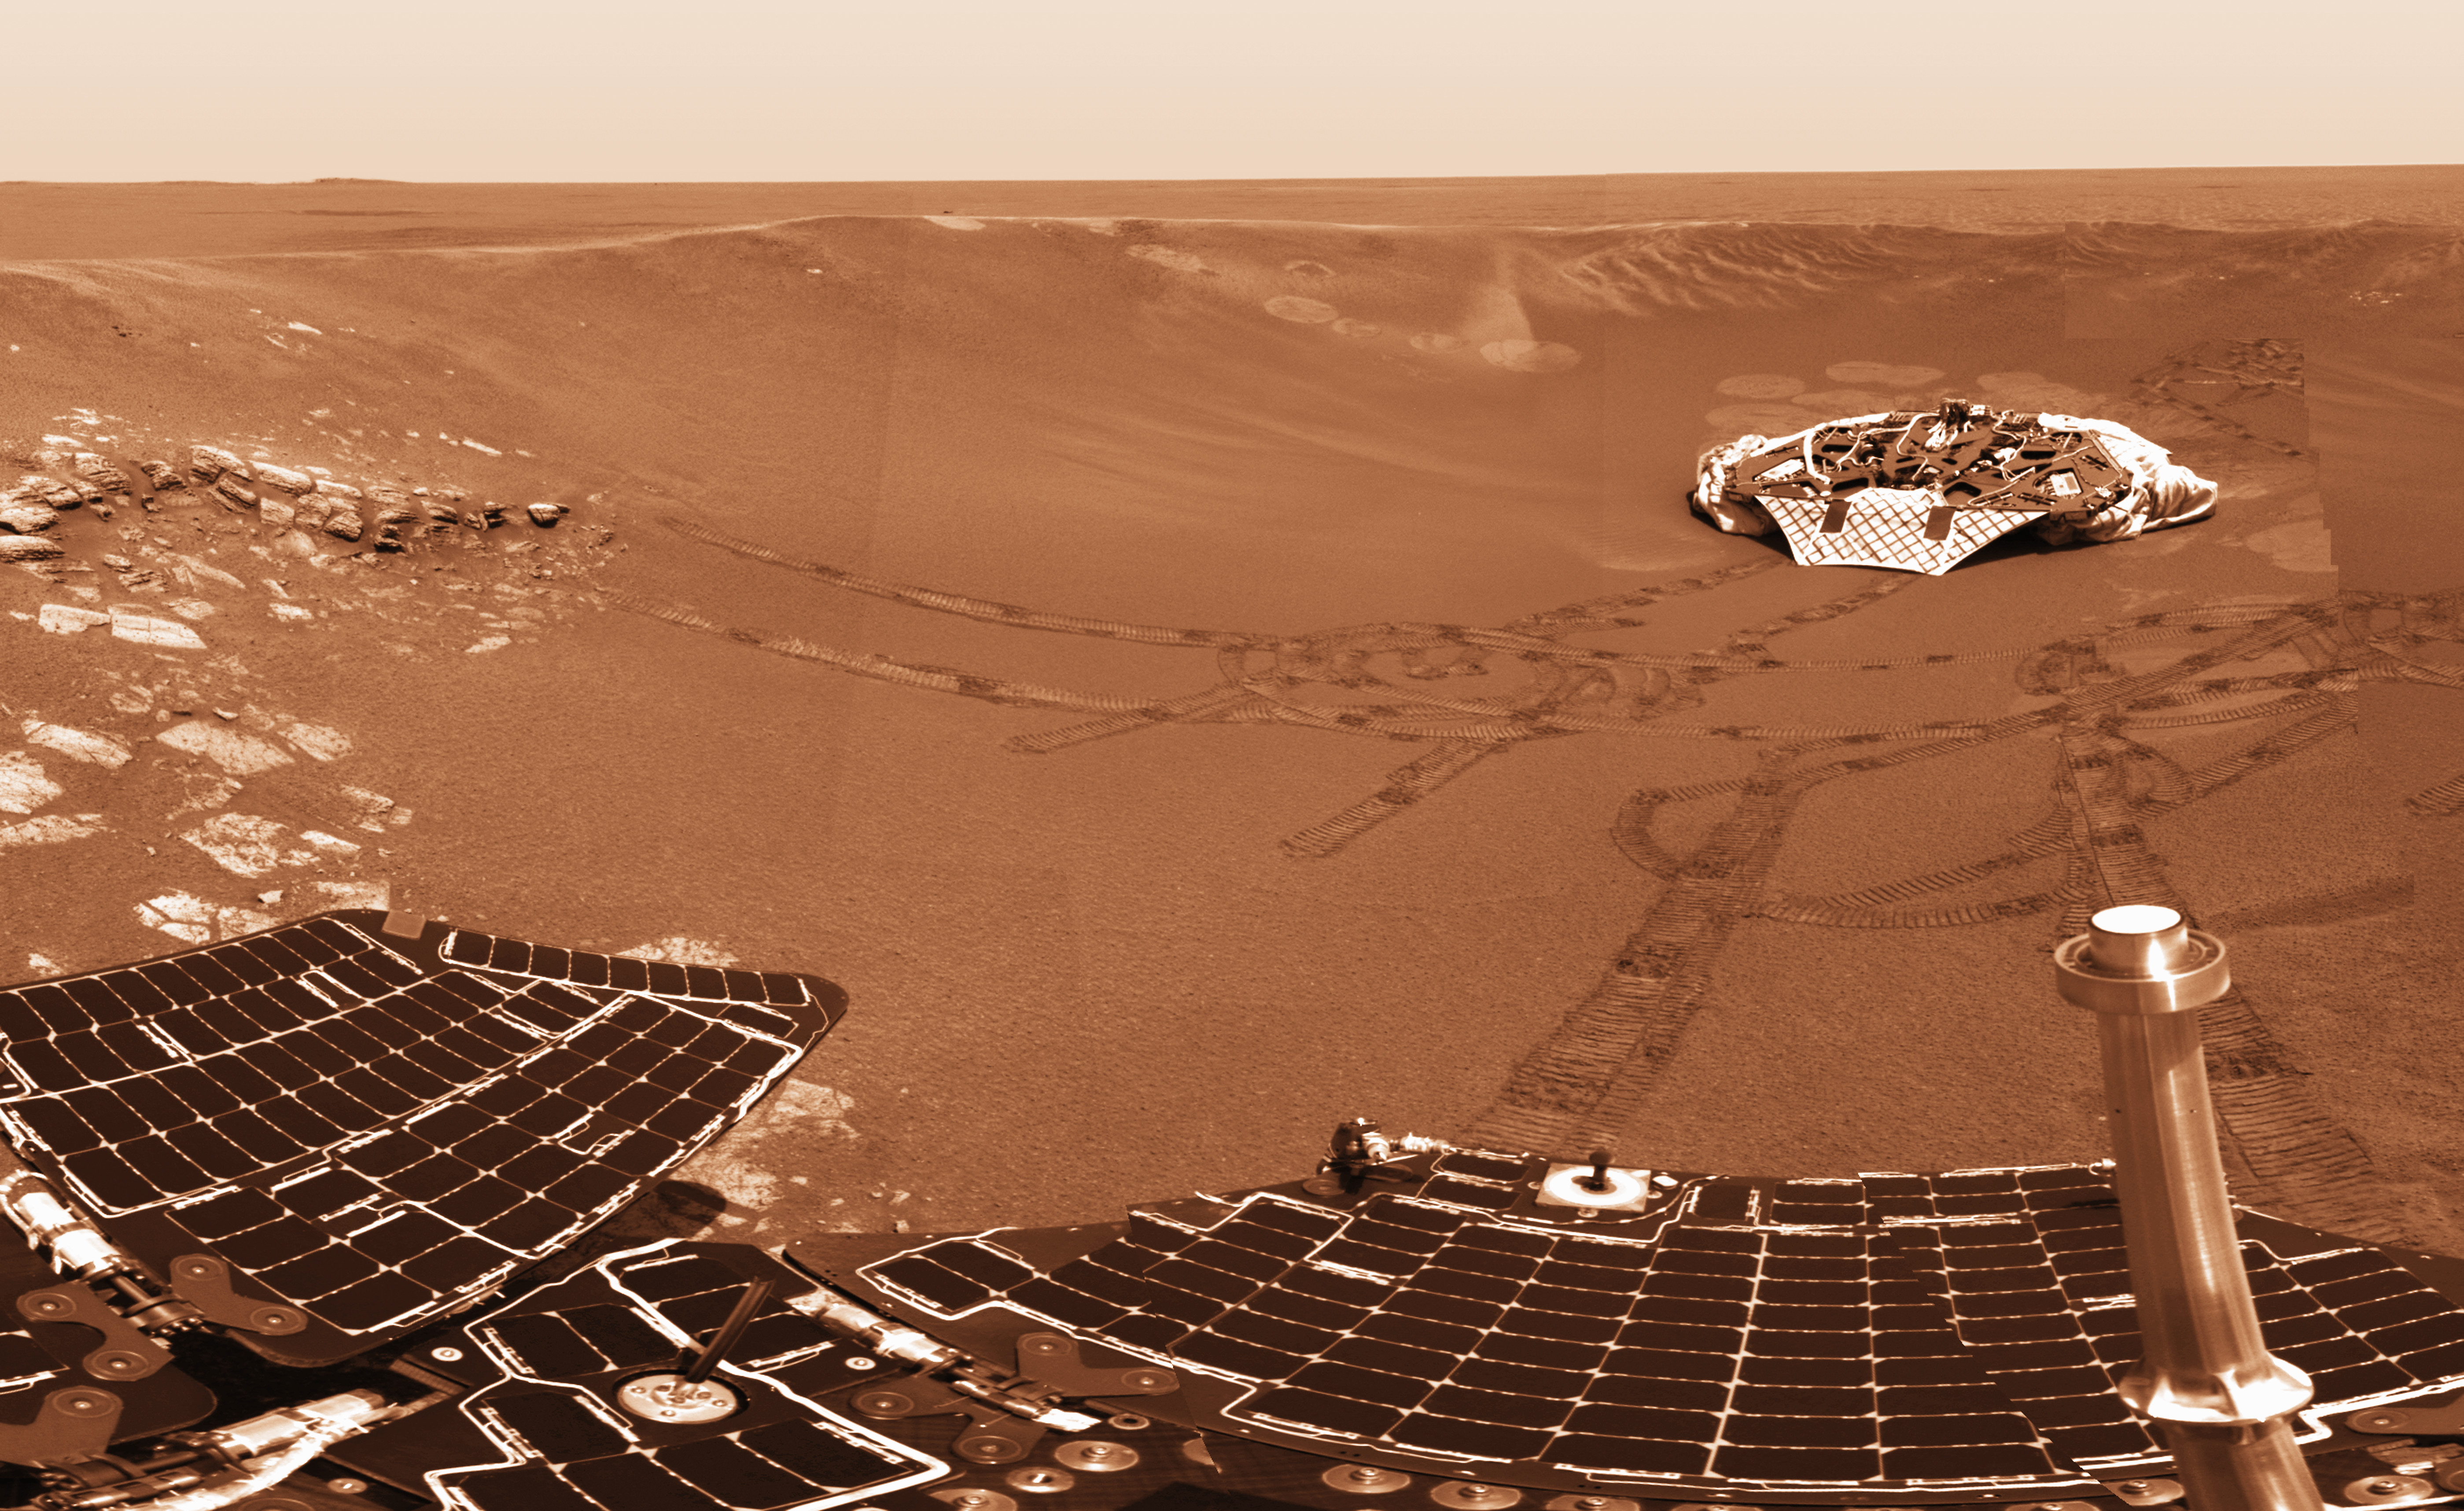 Mars Exploration Rover Opportunity's Solar Panels and Landing Platform, Mars